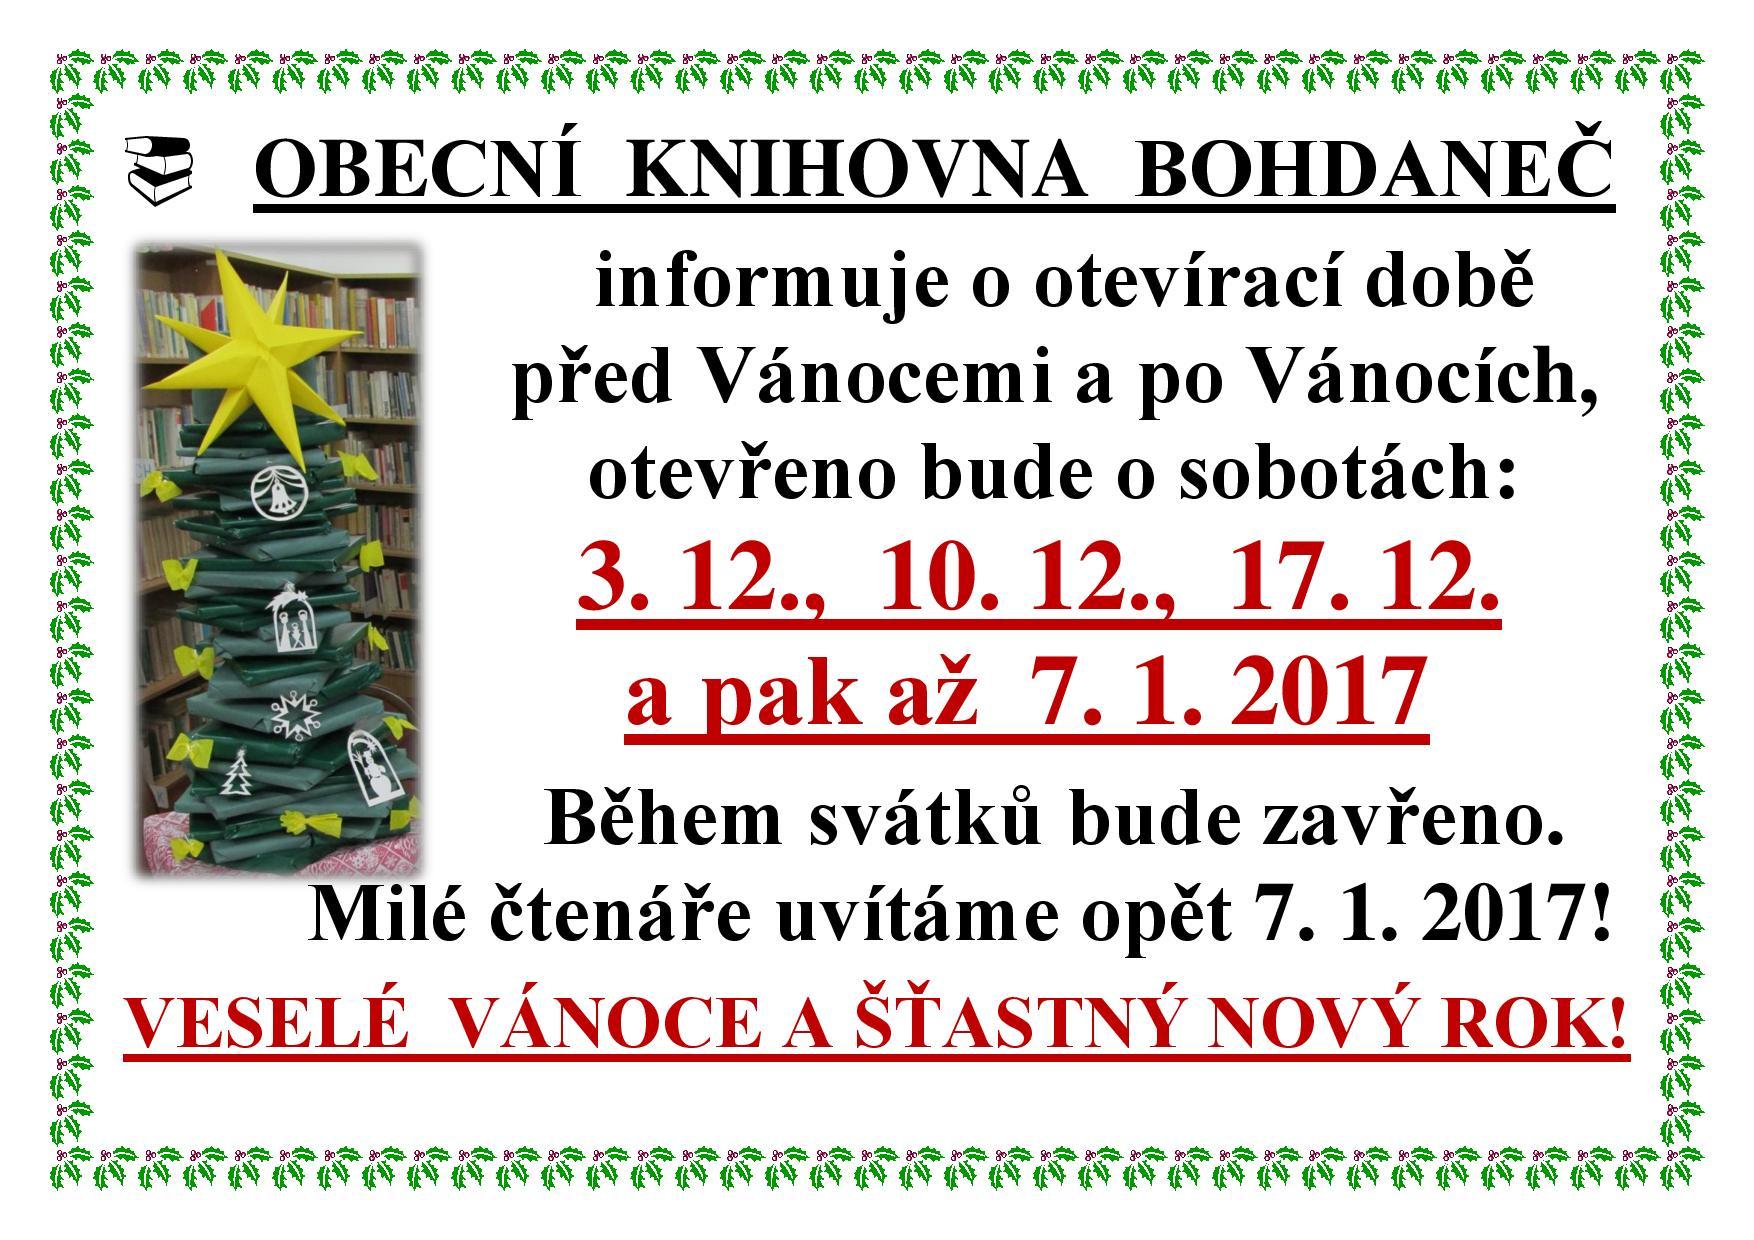 OBRÁZEK : oteviraci_doba_vanoce_2016-page-001.jpg